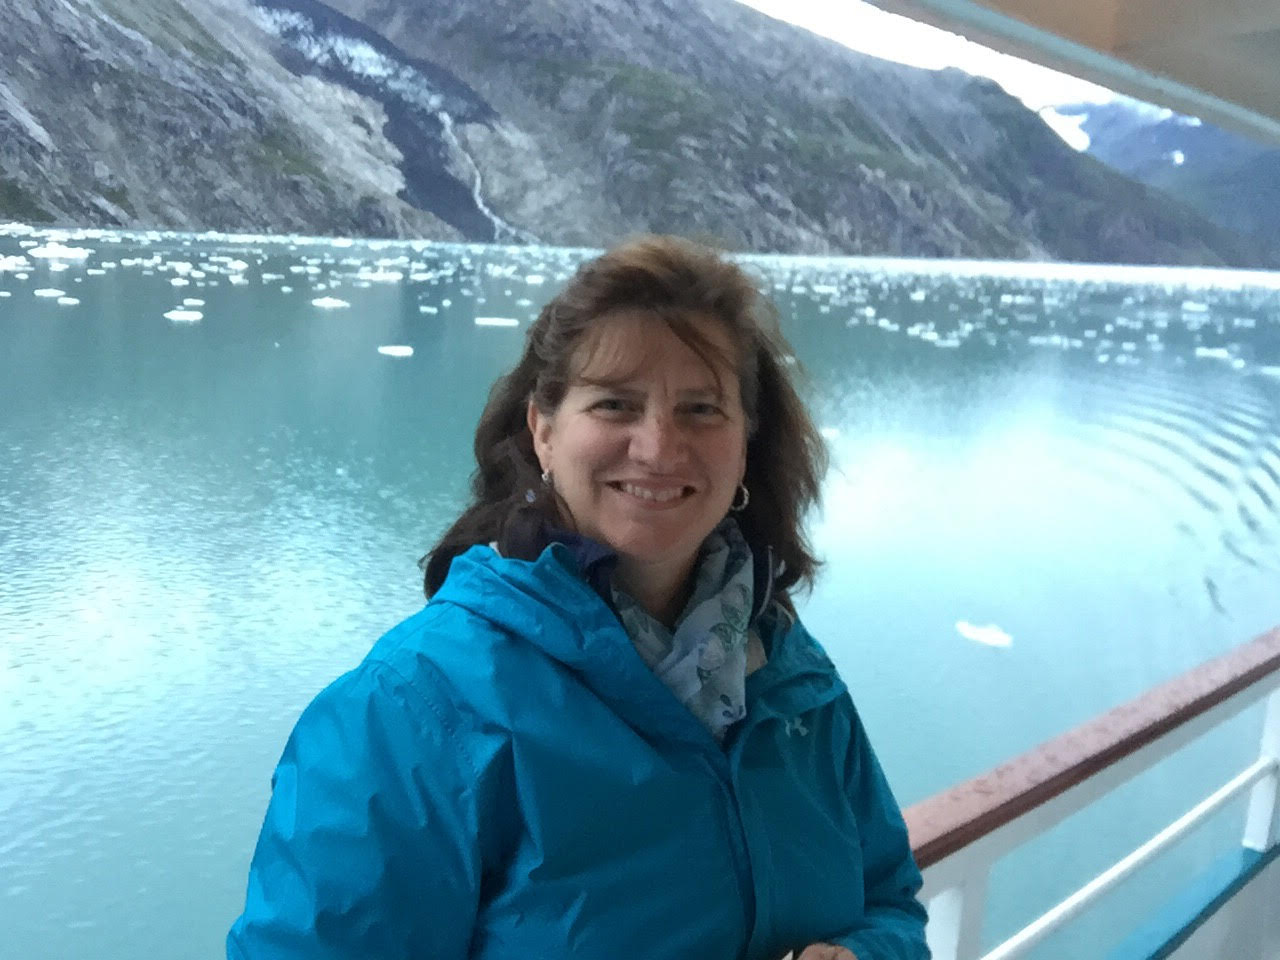 Noreen Frenaye, USNA Travel Director